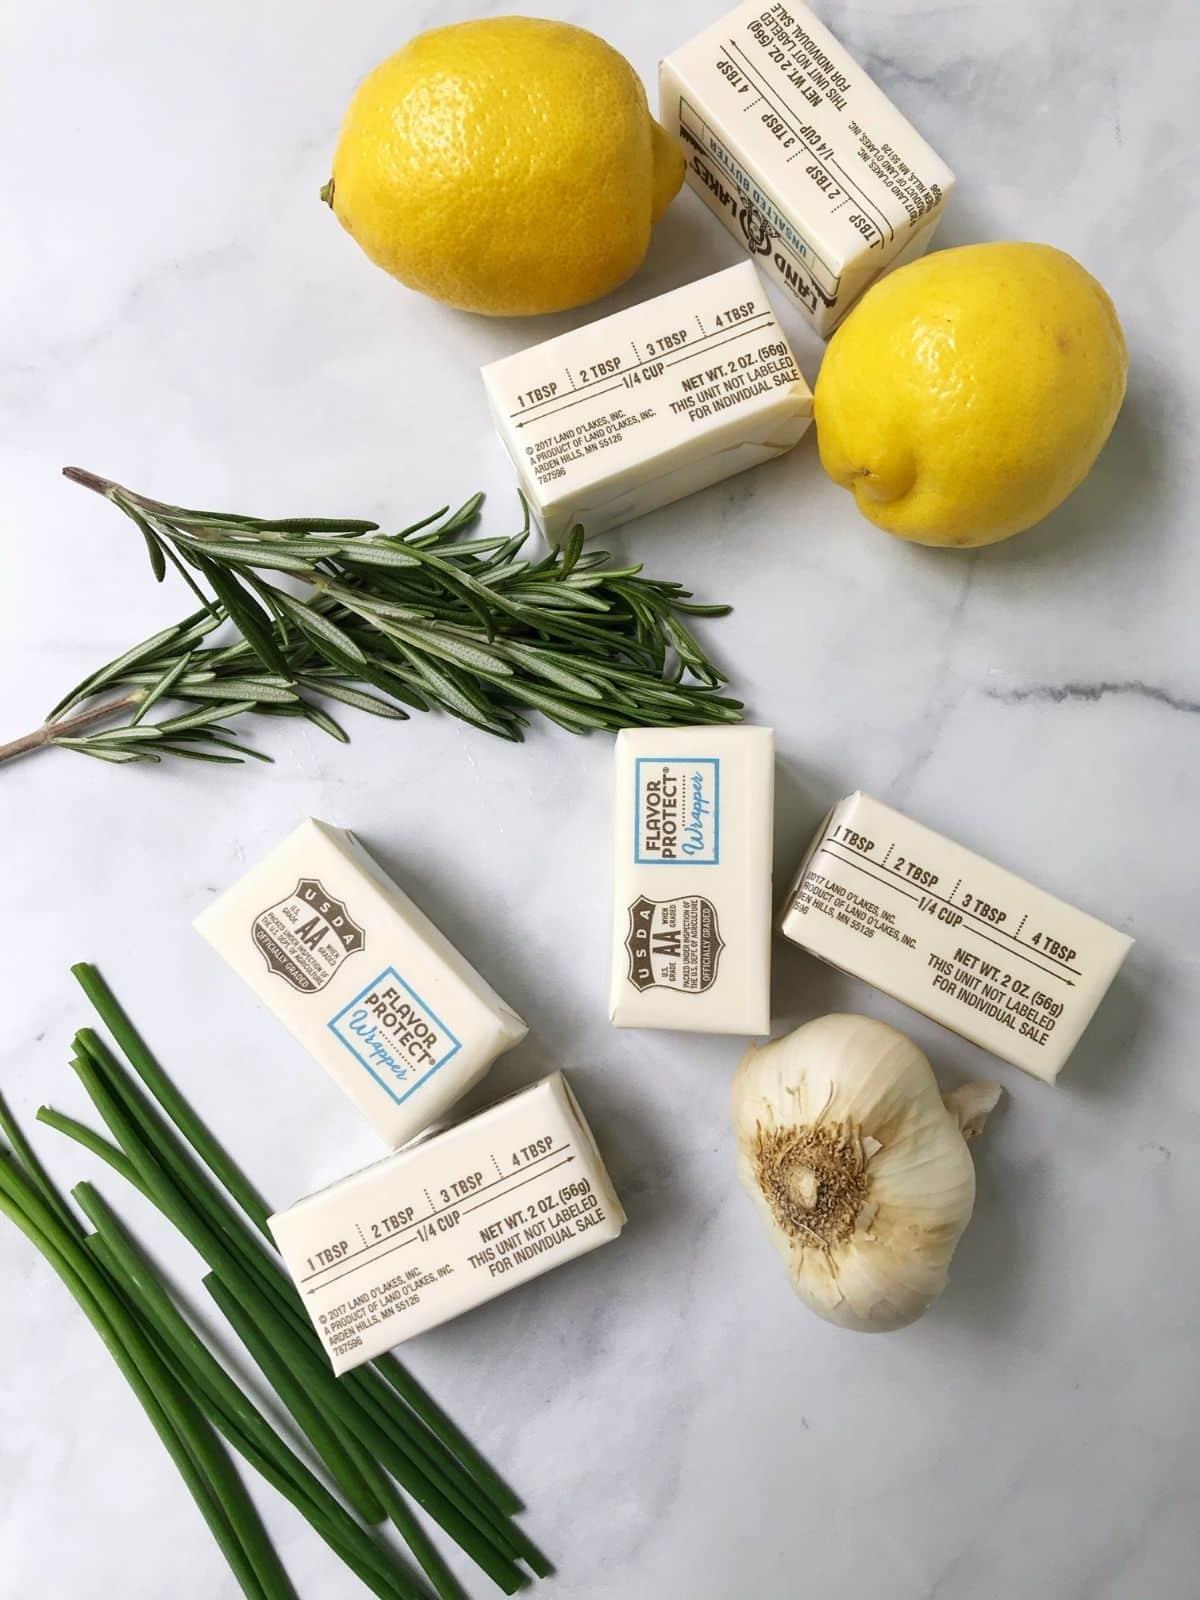 ingredients - butter, lemons, rosemary, garlic, chives